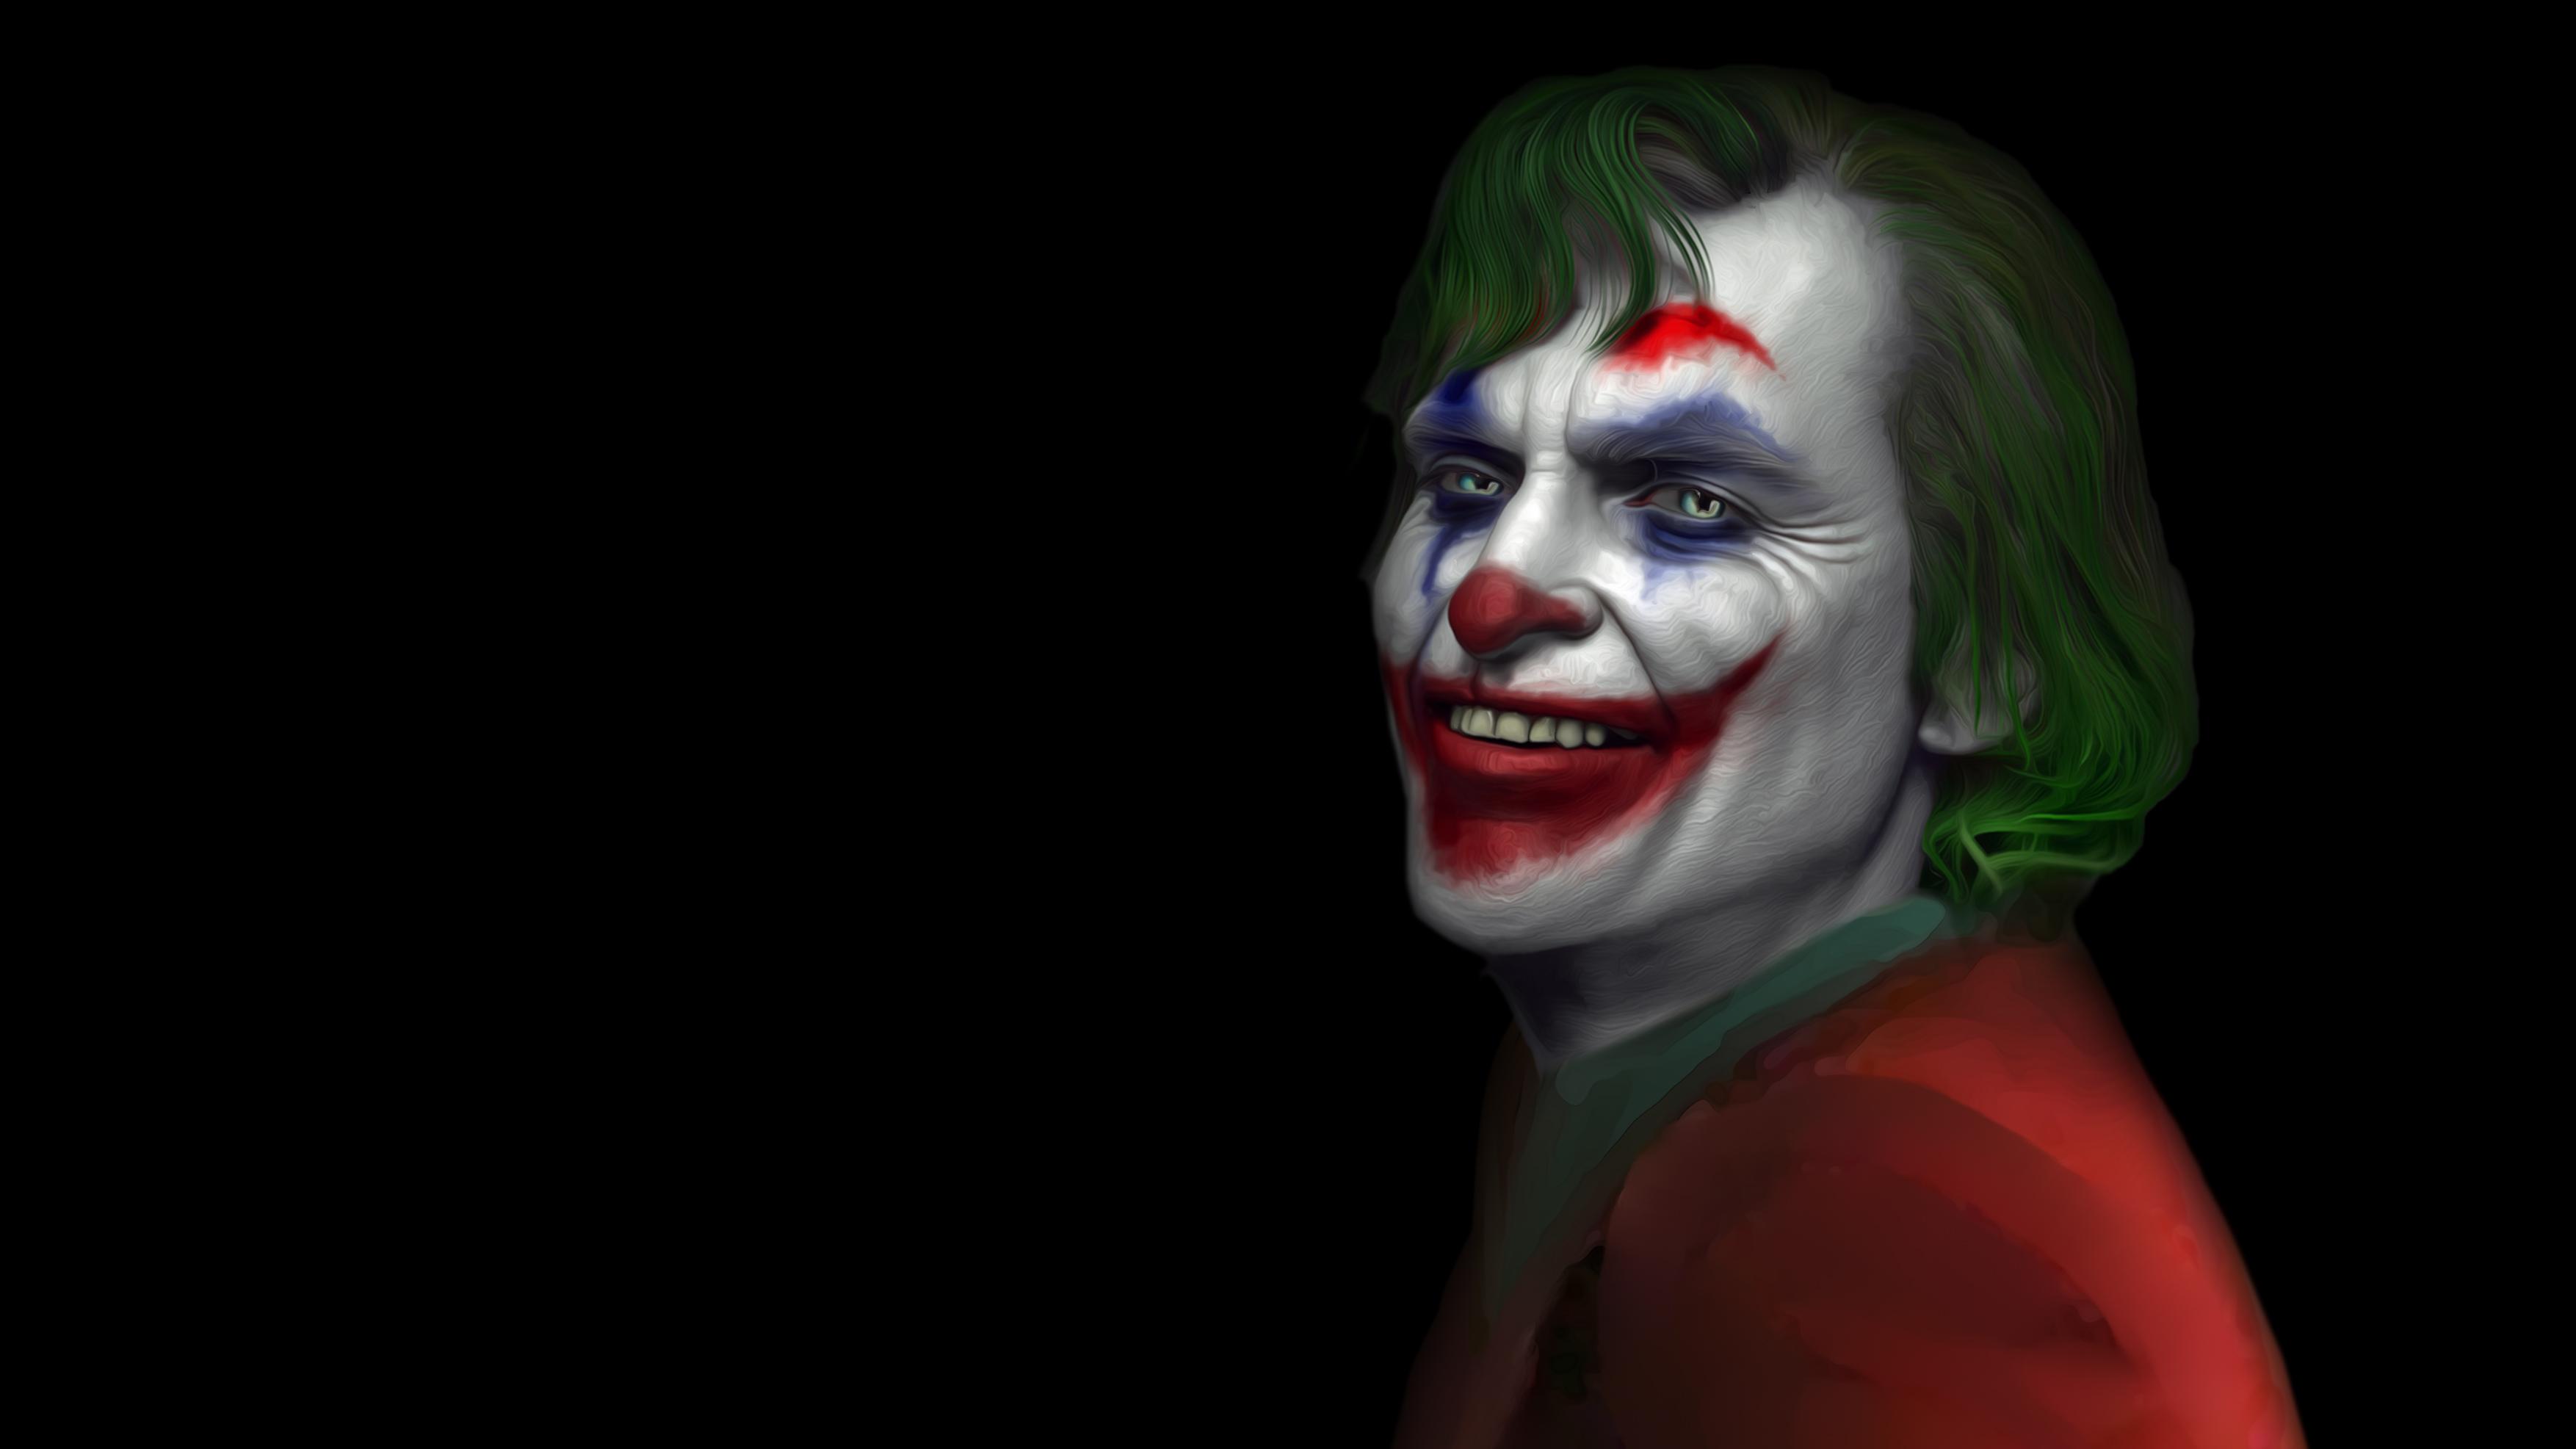 Joker Movie Joaquin Phoenix 2019 Hd Superheroes 4k